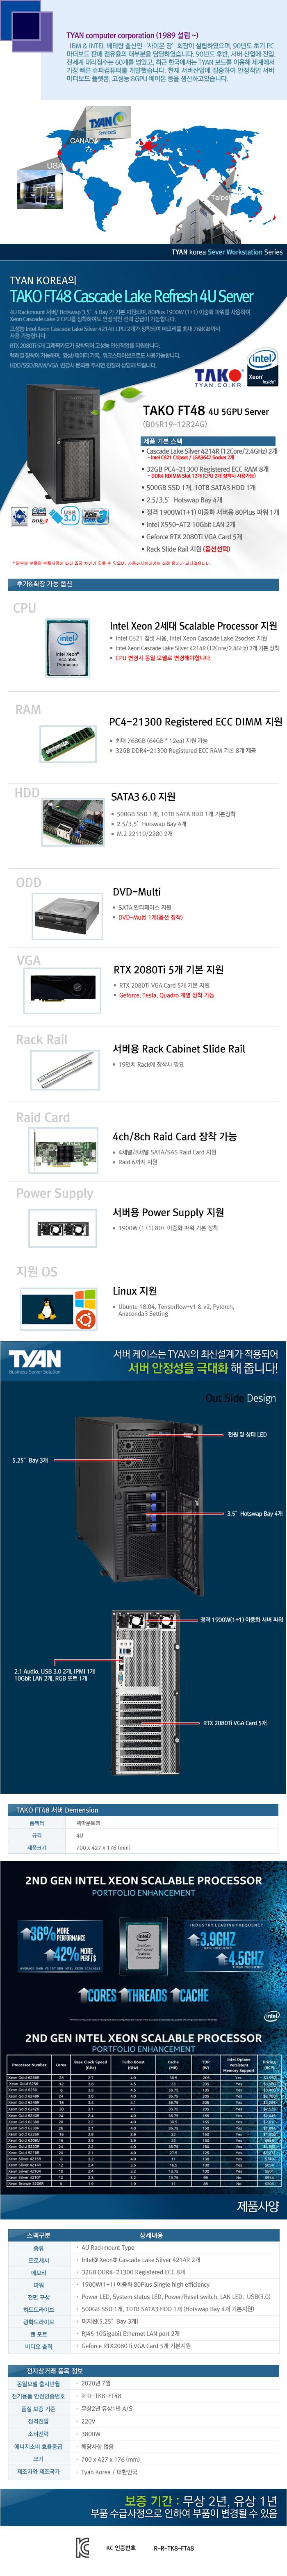 TYAN TAKO-FT48-(B05R19-12R24G) 5GPU (256GB, SSD 500GB + 10TB)